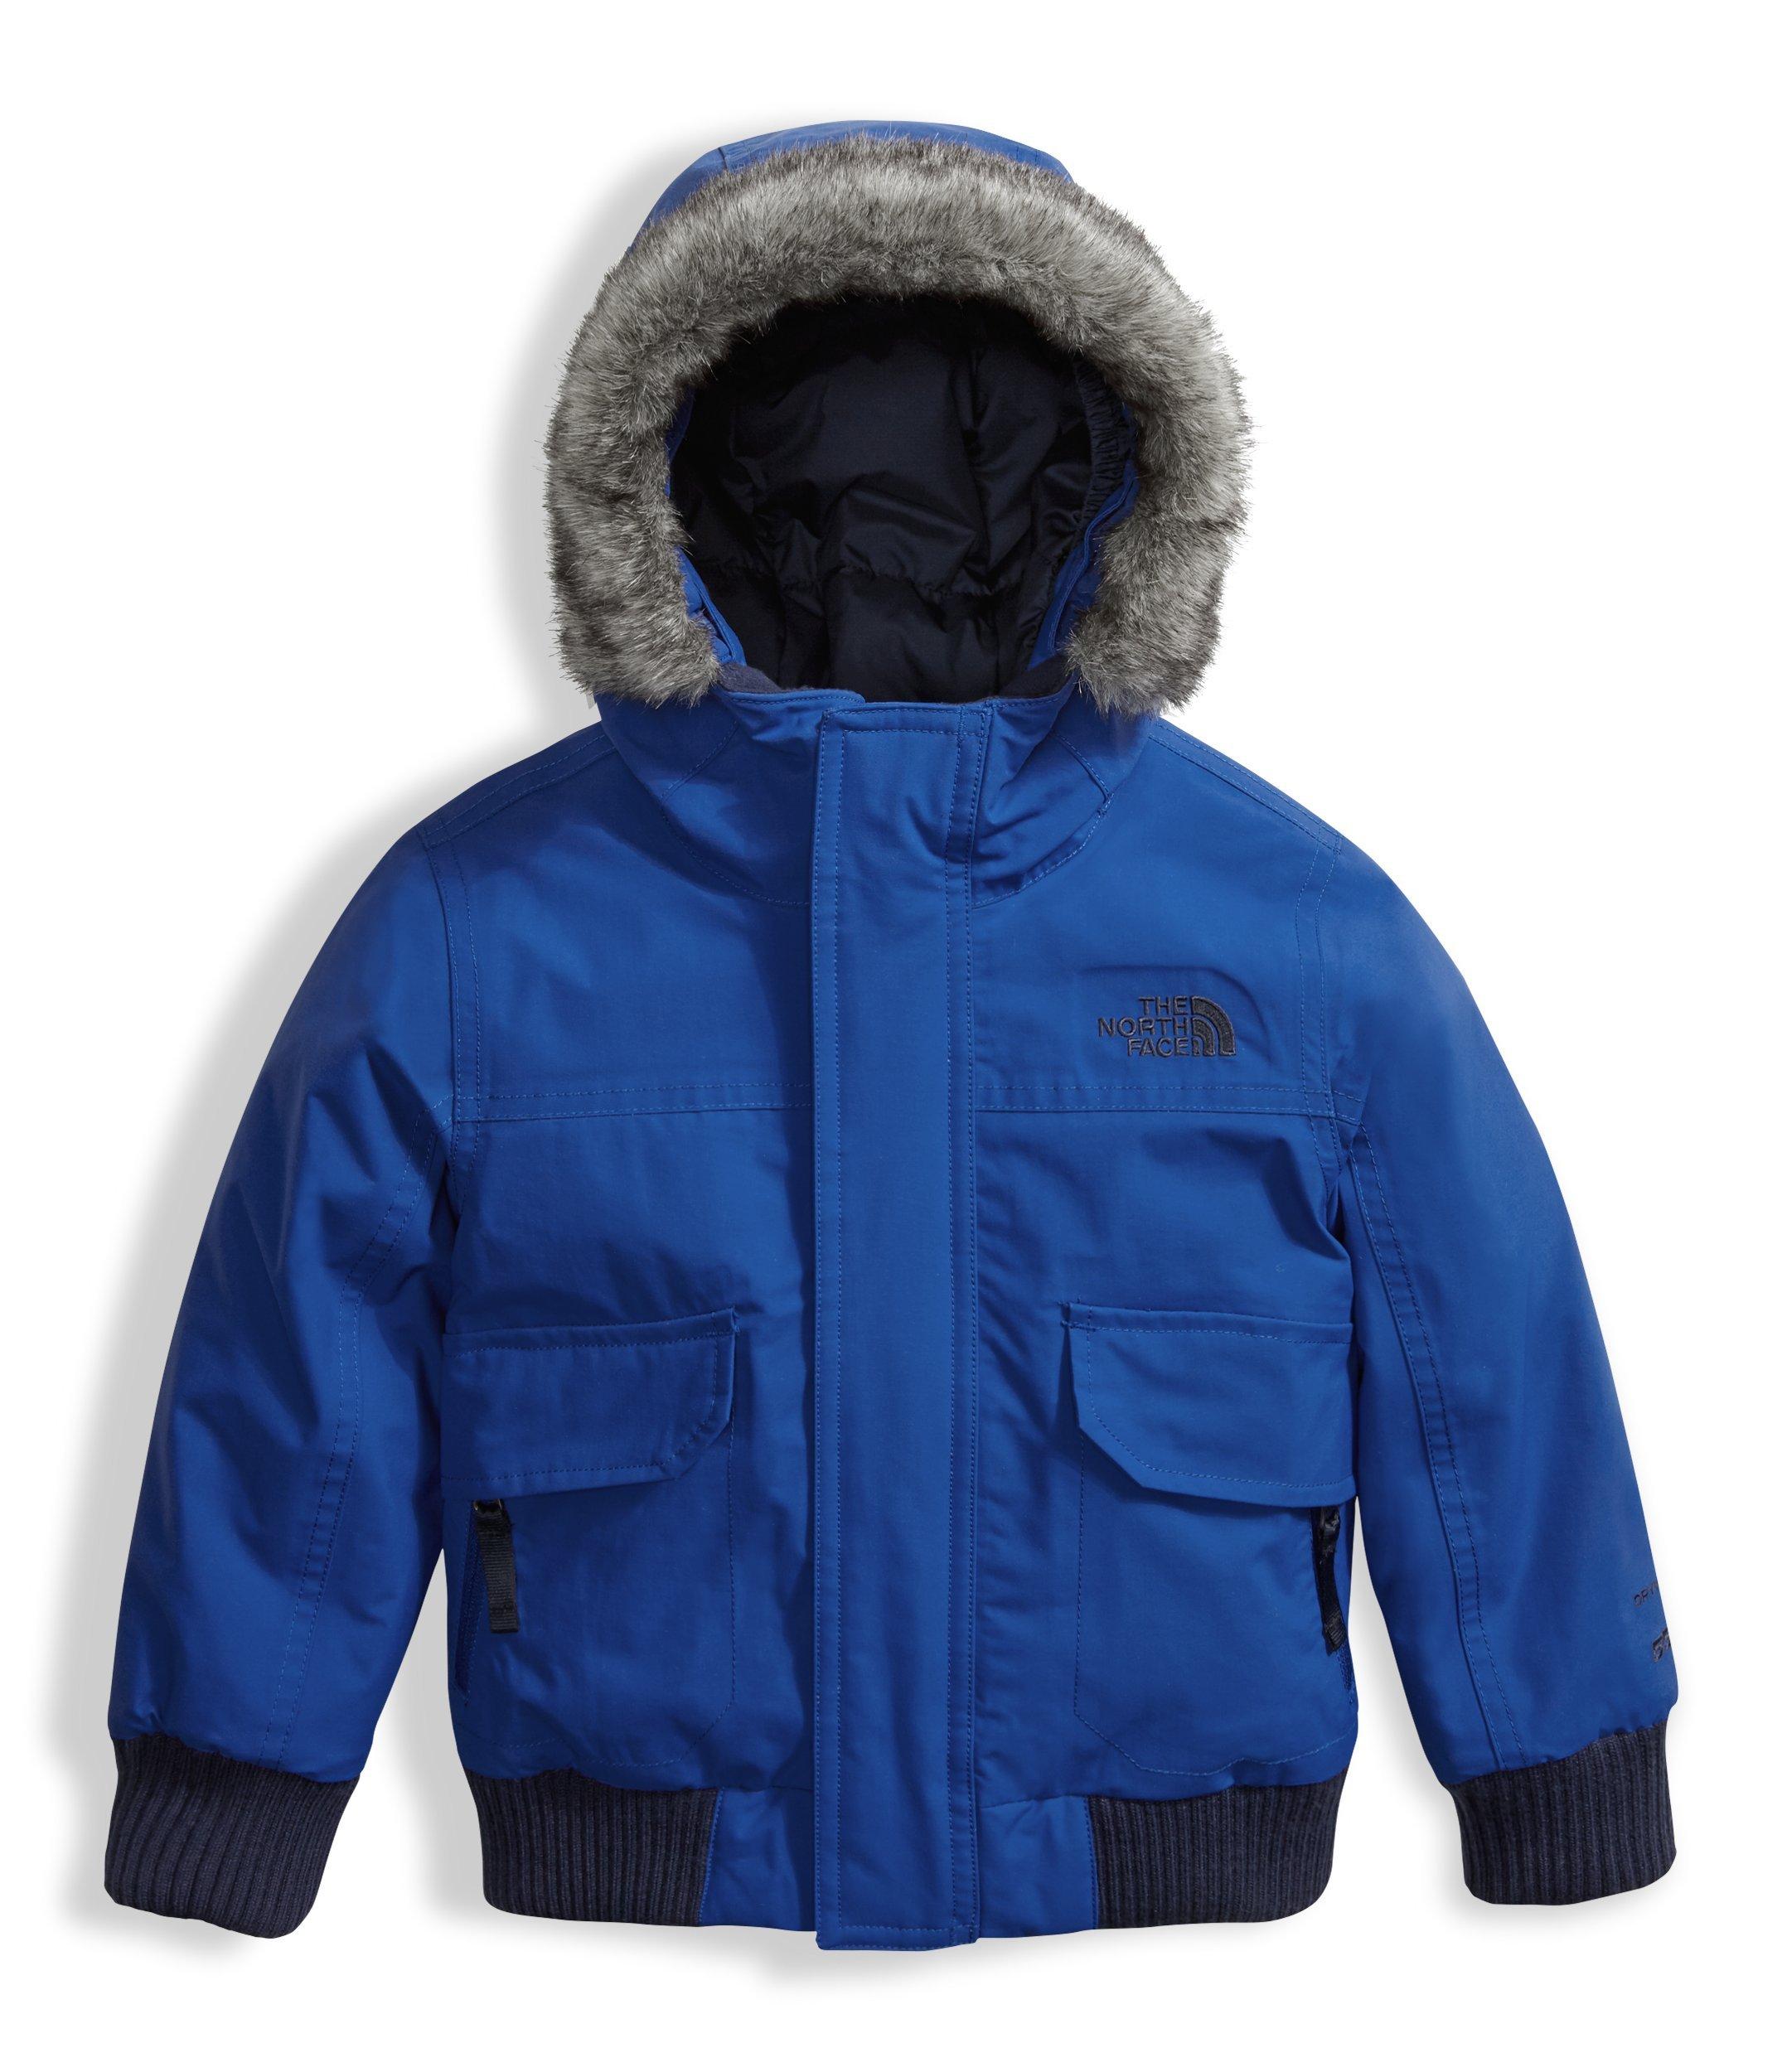 The North Face Toddler Boys Gotham Down Jacket Bright Cobalt Blue (4 Toddler)